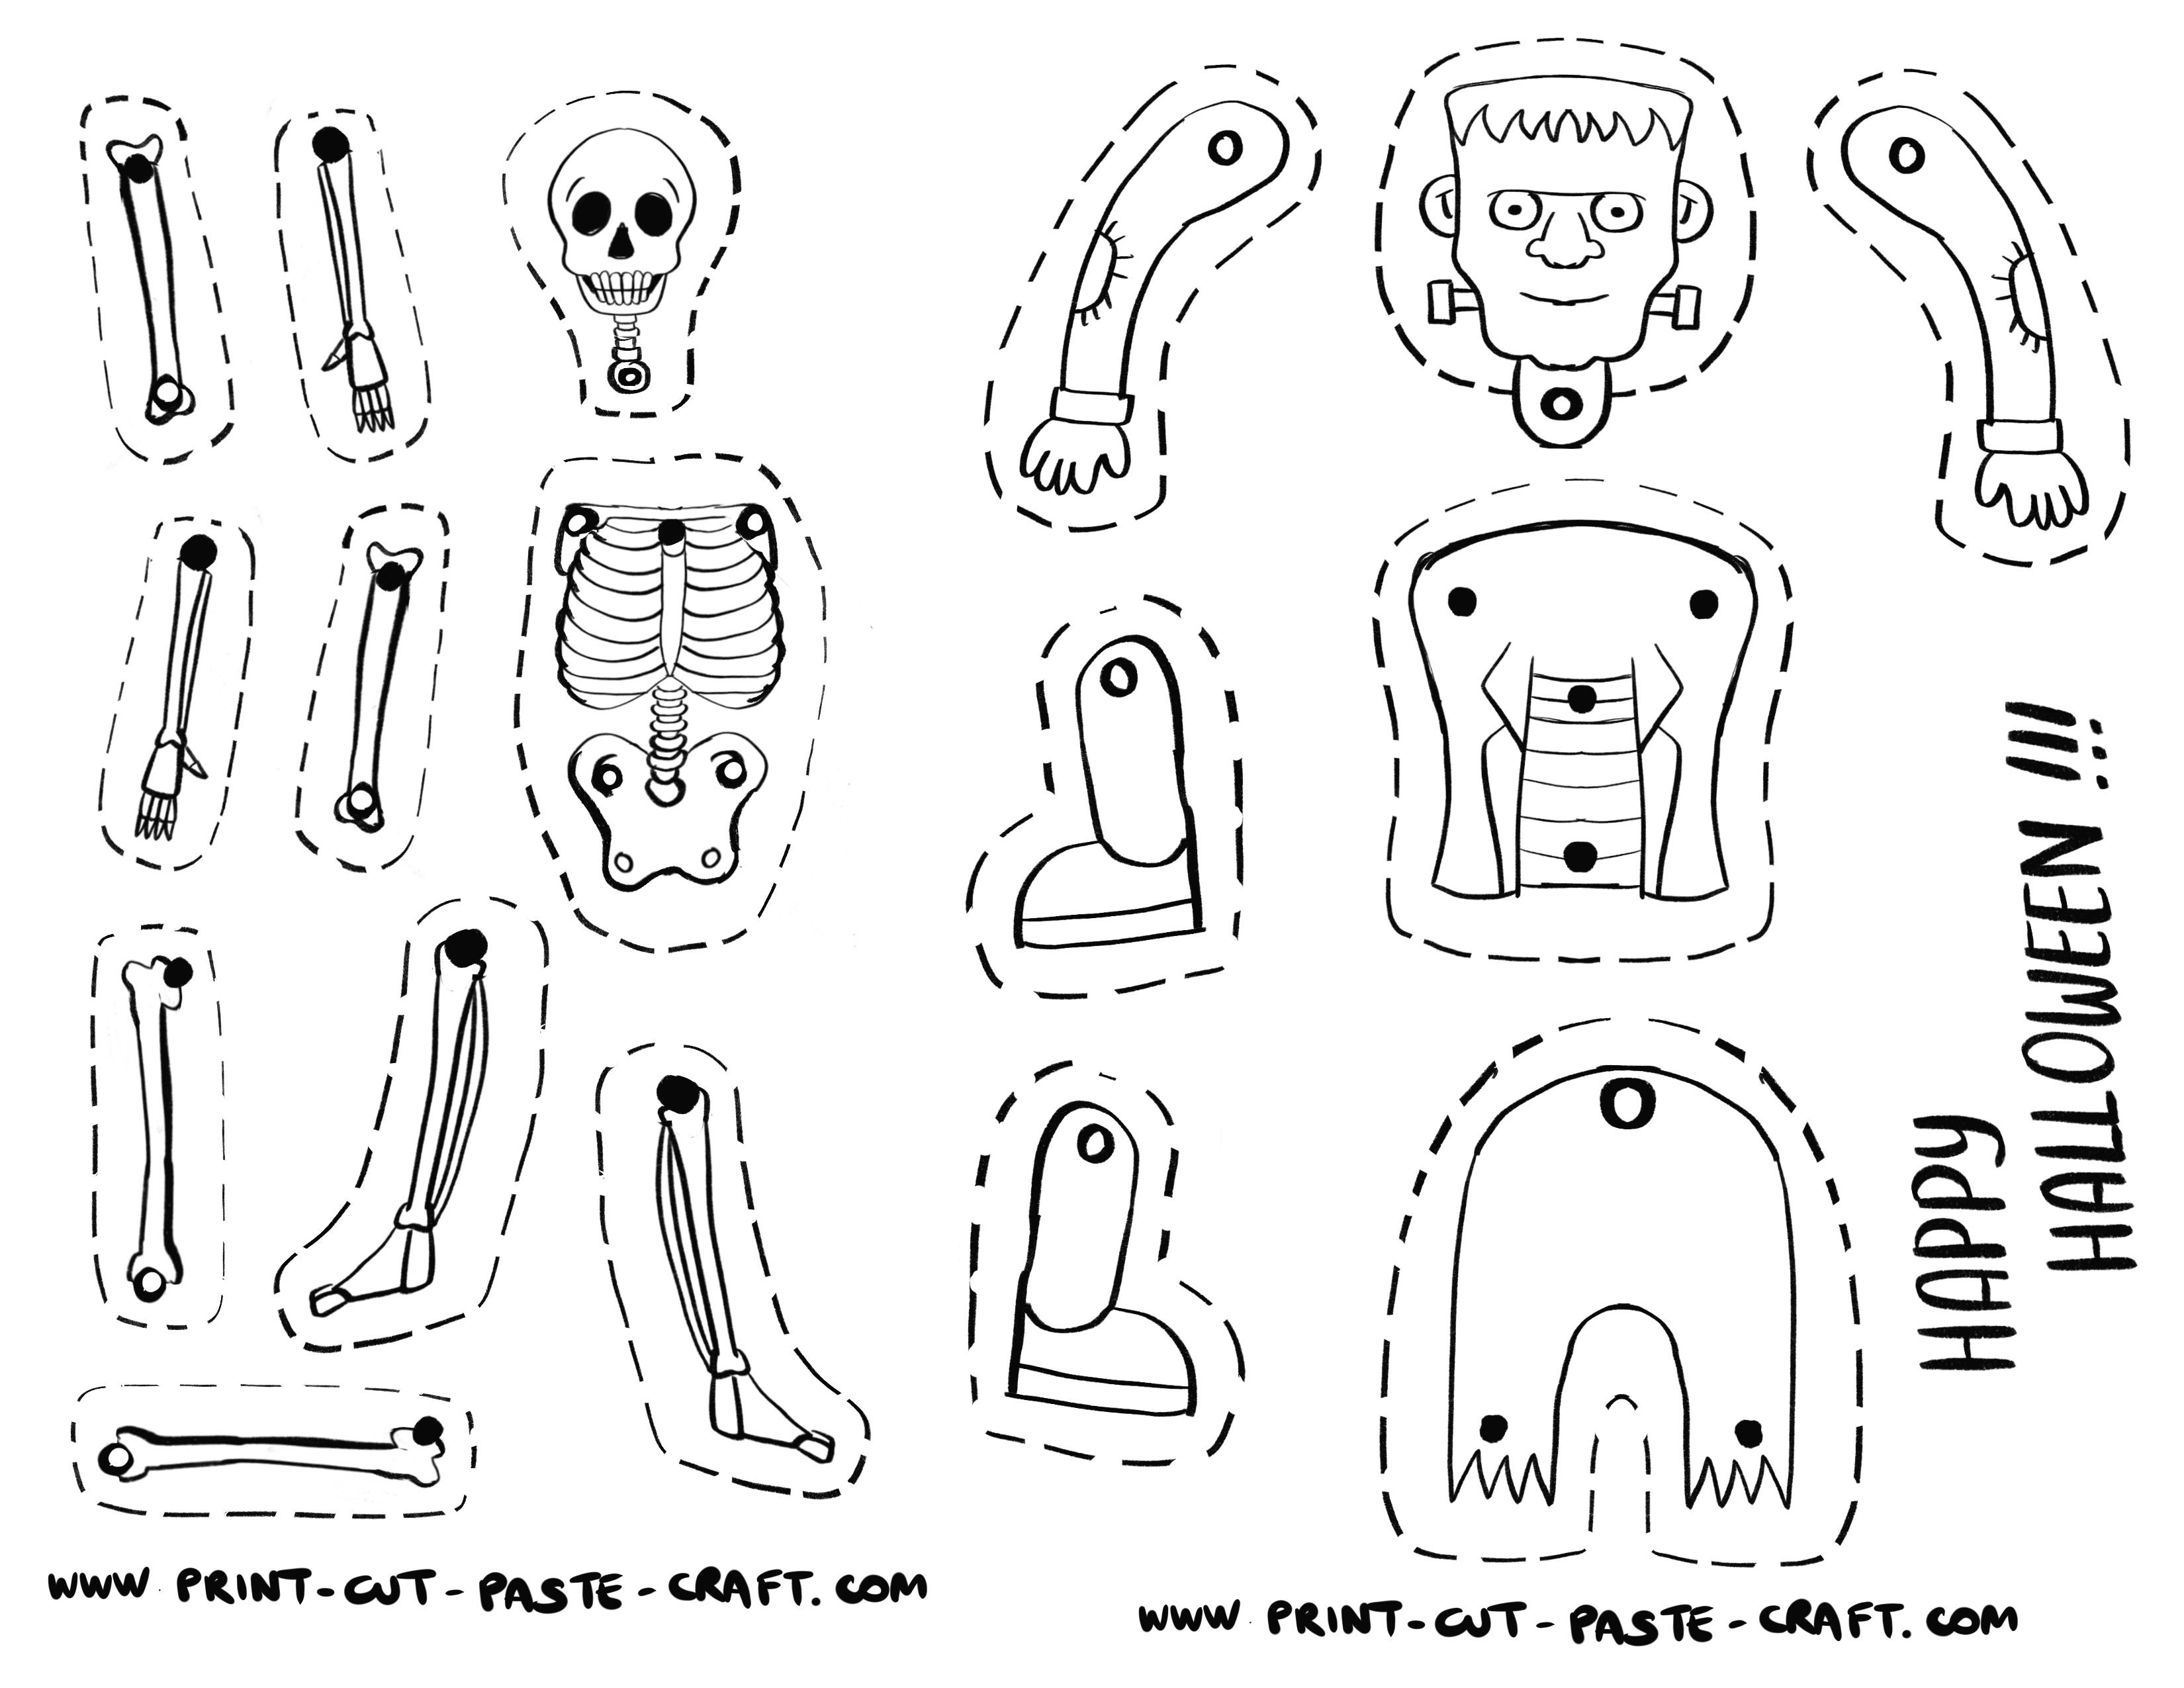 Free Printable Halloween Craft Dancing Skeleton And